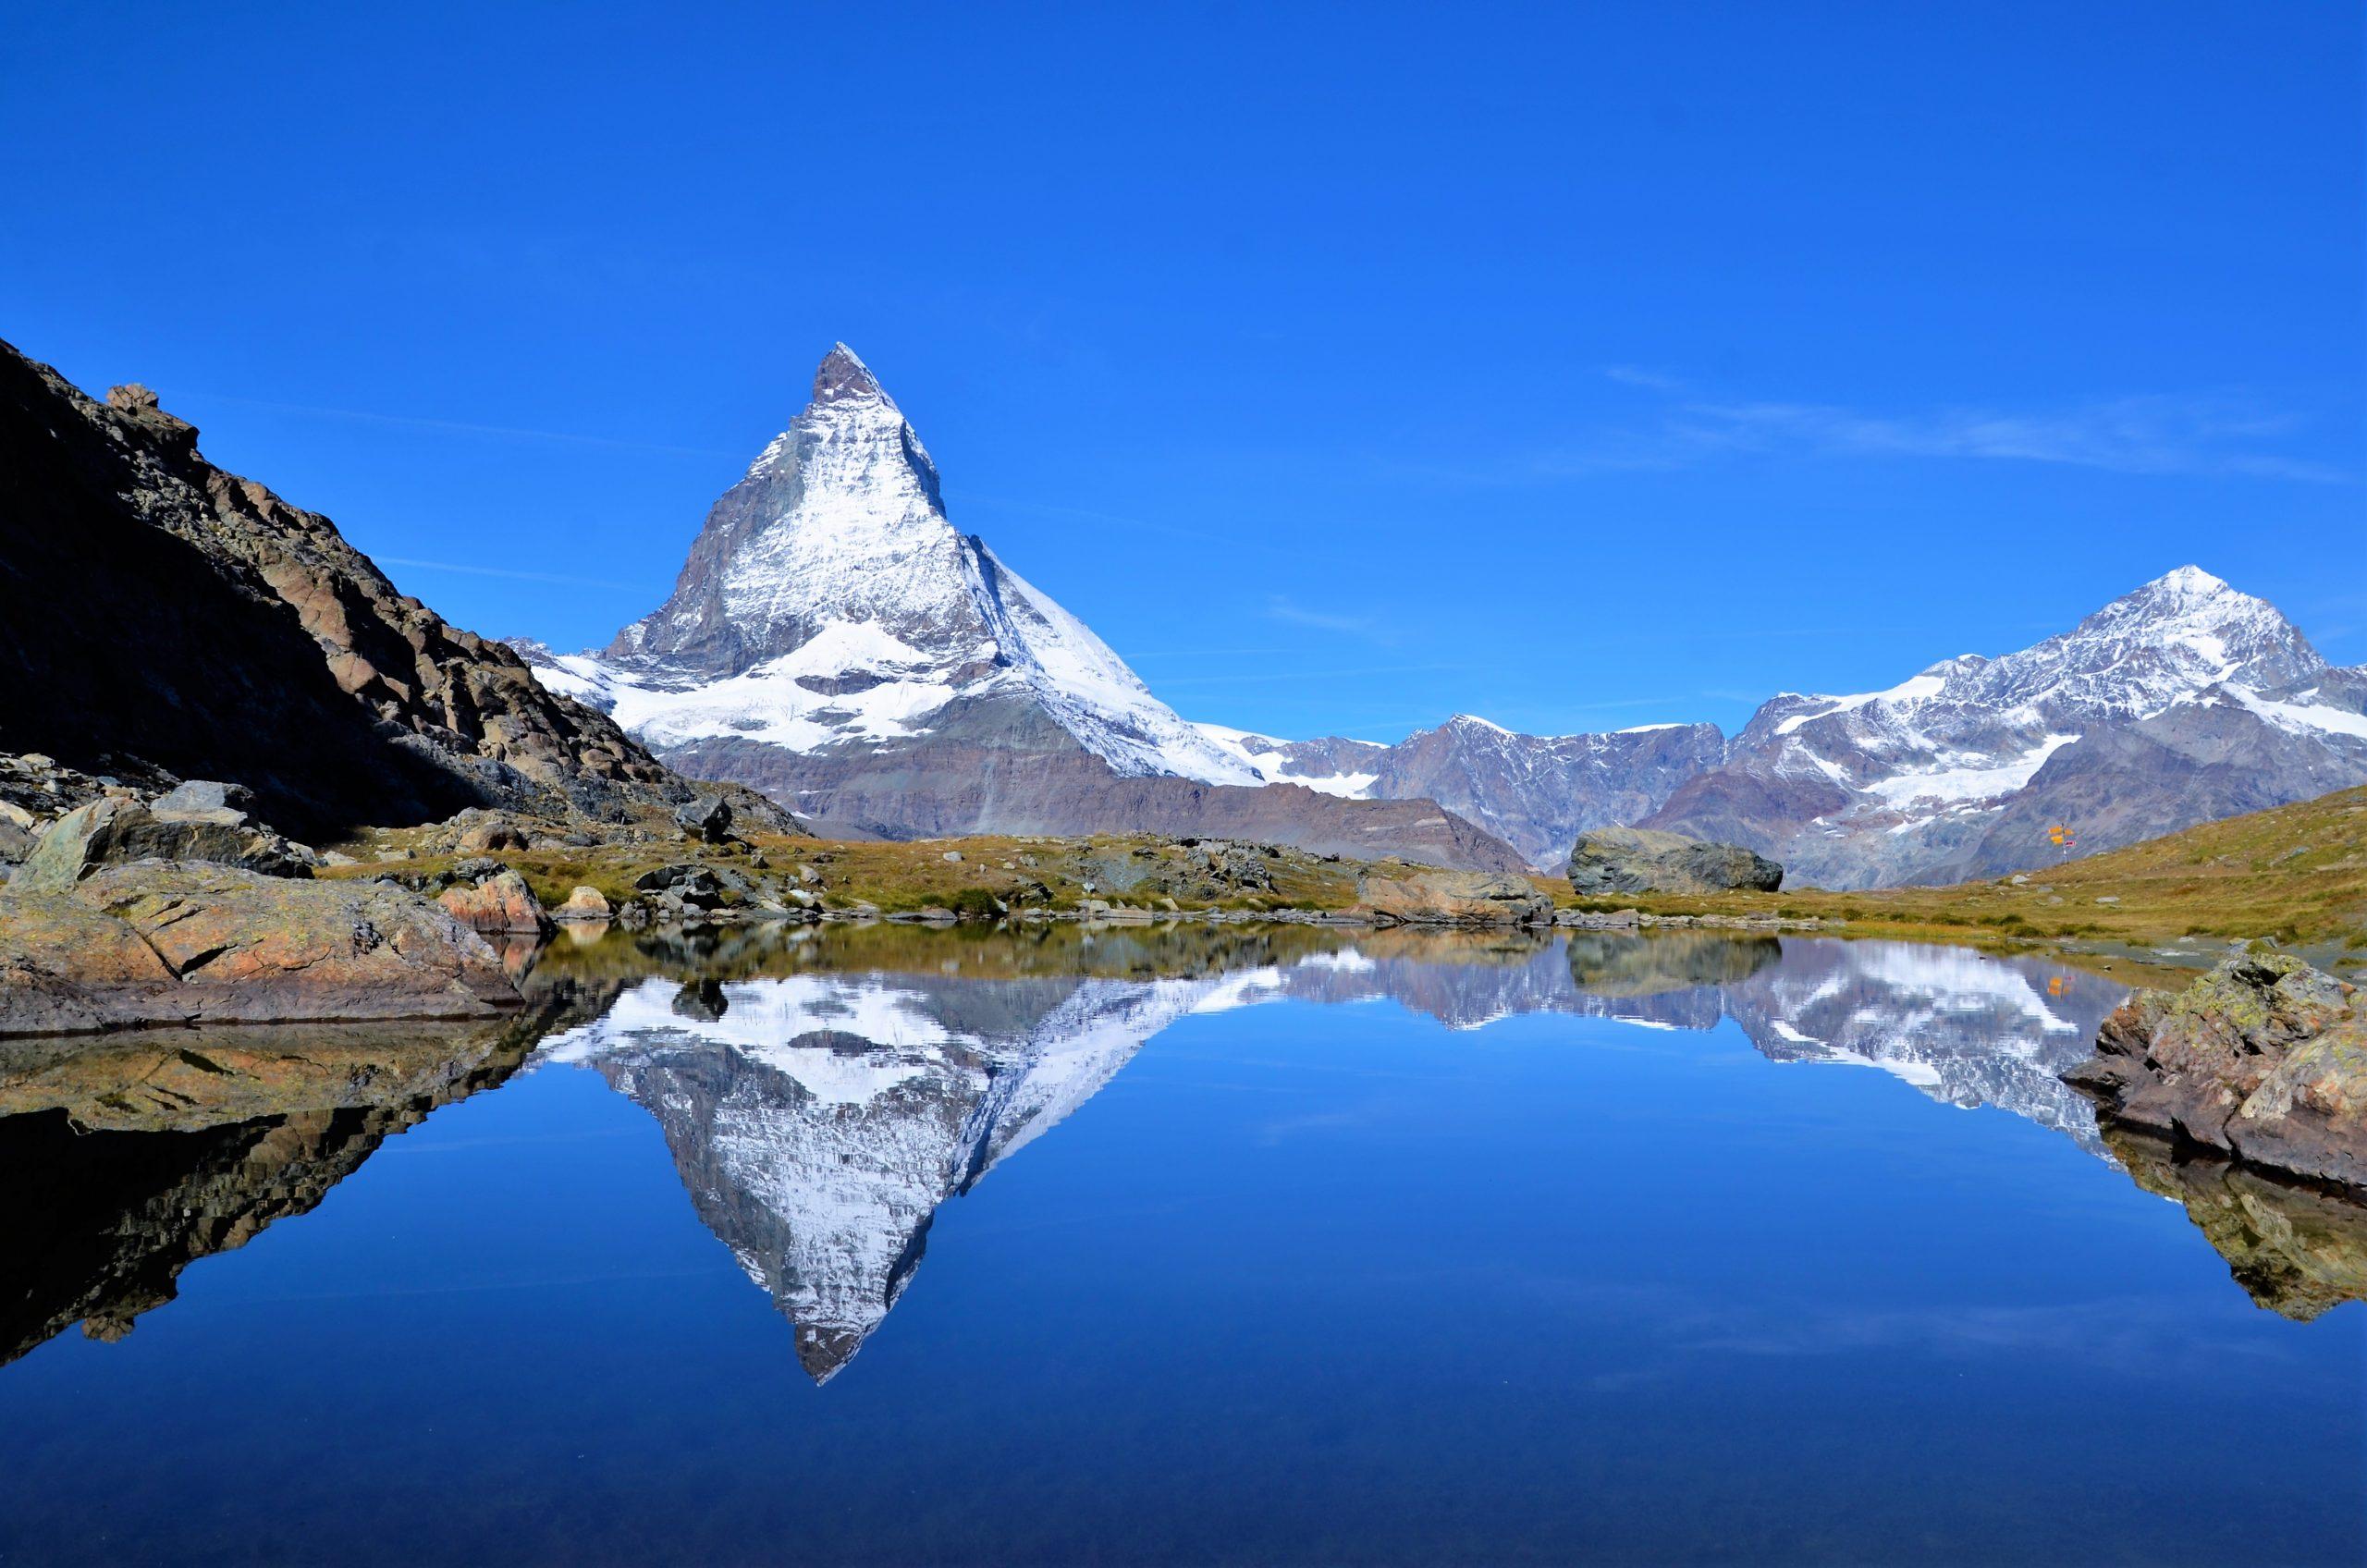 Das Matterhorn im Kanton Wallis